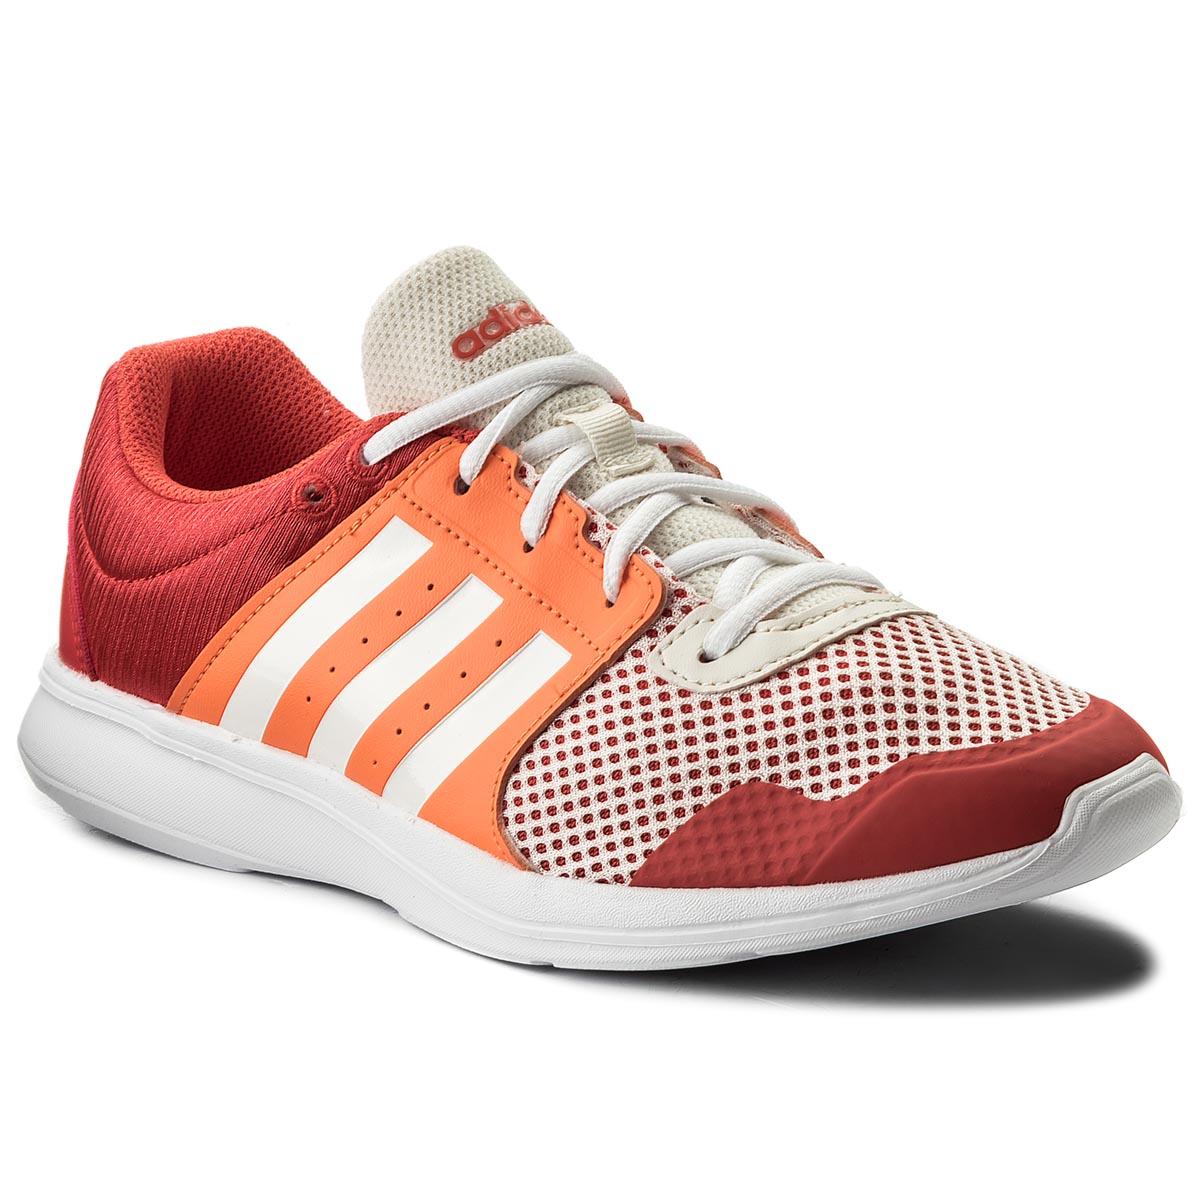 best authentic 928ba f4ea3 Cipő adidas - Essential Fun II W CP8948 Reacor Ftwwht Hireor